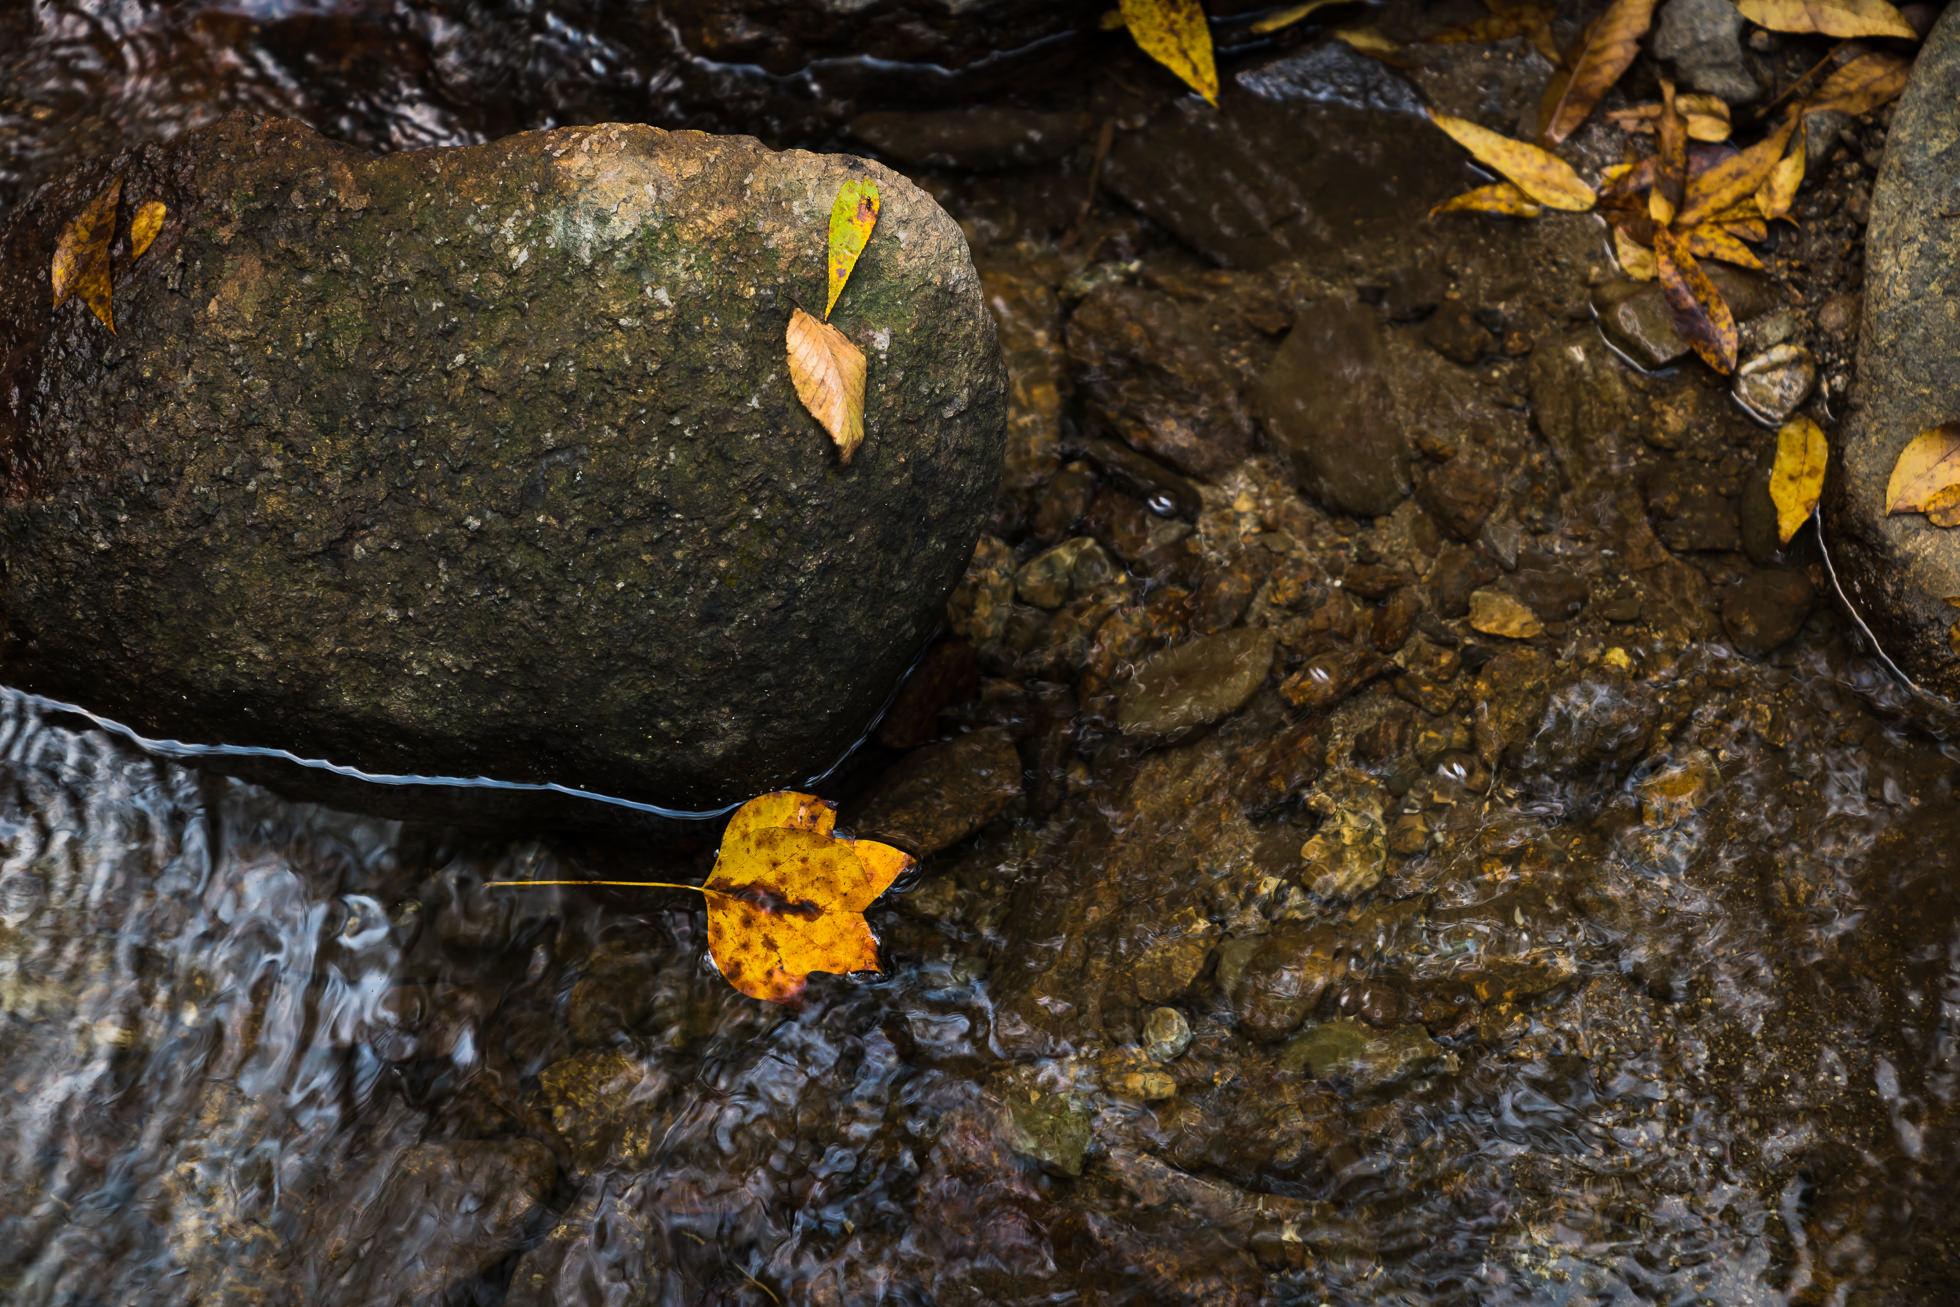 crabtree falls campground stream, tye rive, fallen leaf